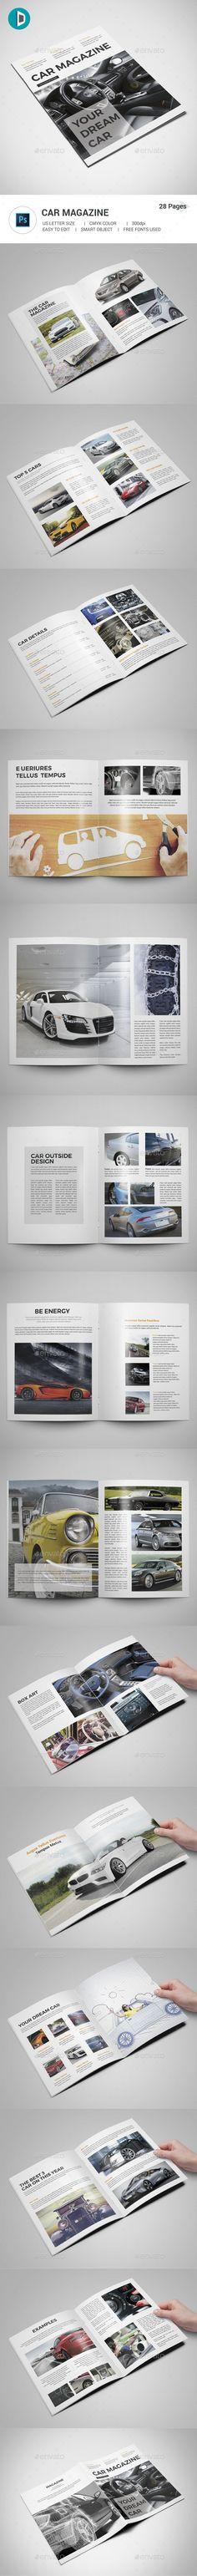 Car Magazine - Magazines Print Templates Download here : https://graphicriver.net/item/car-magazine/19452141?s_rank=33&ref=Al-fatih